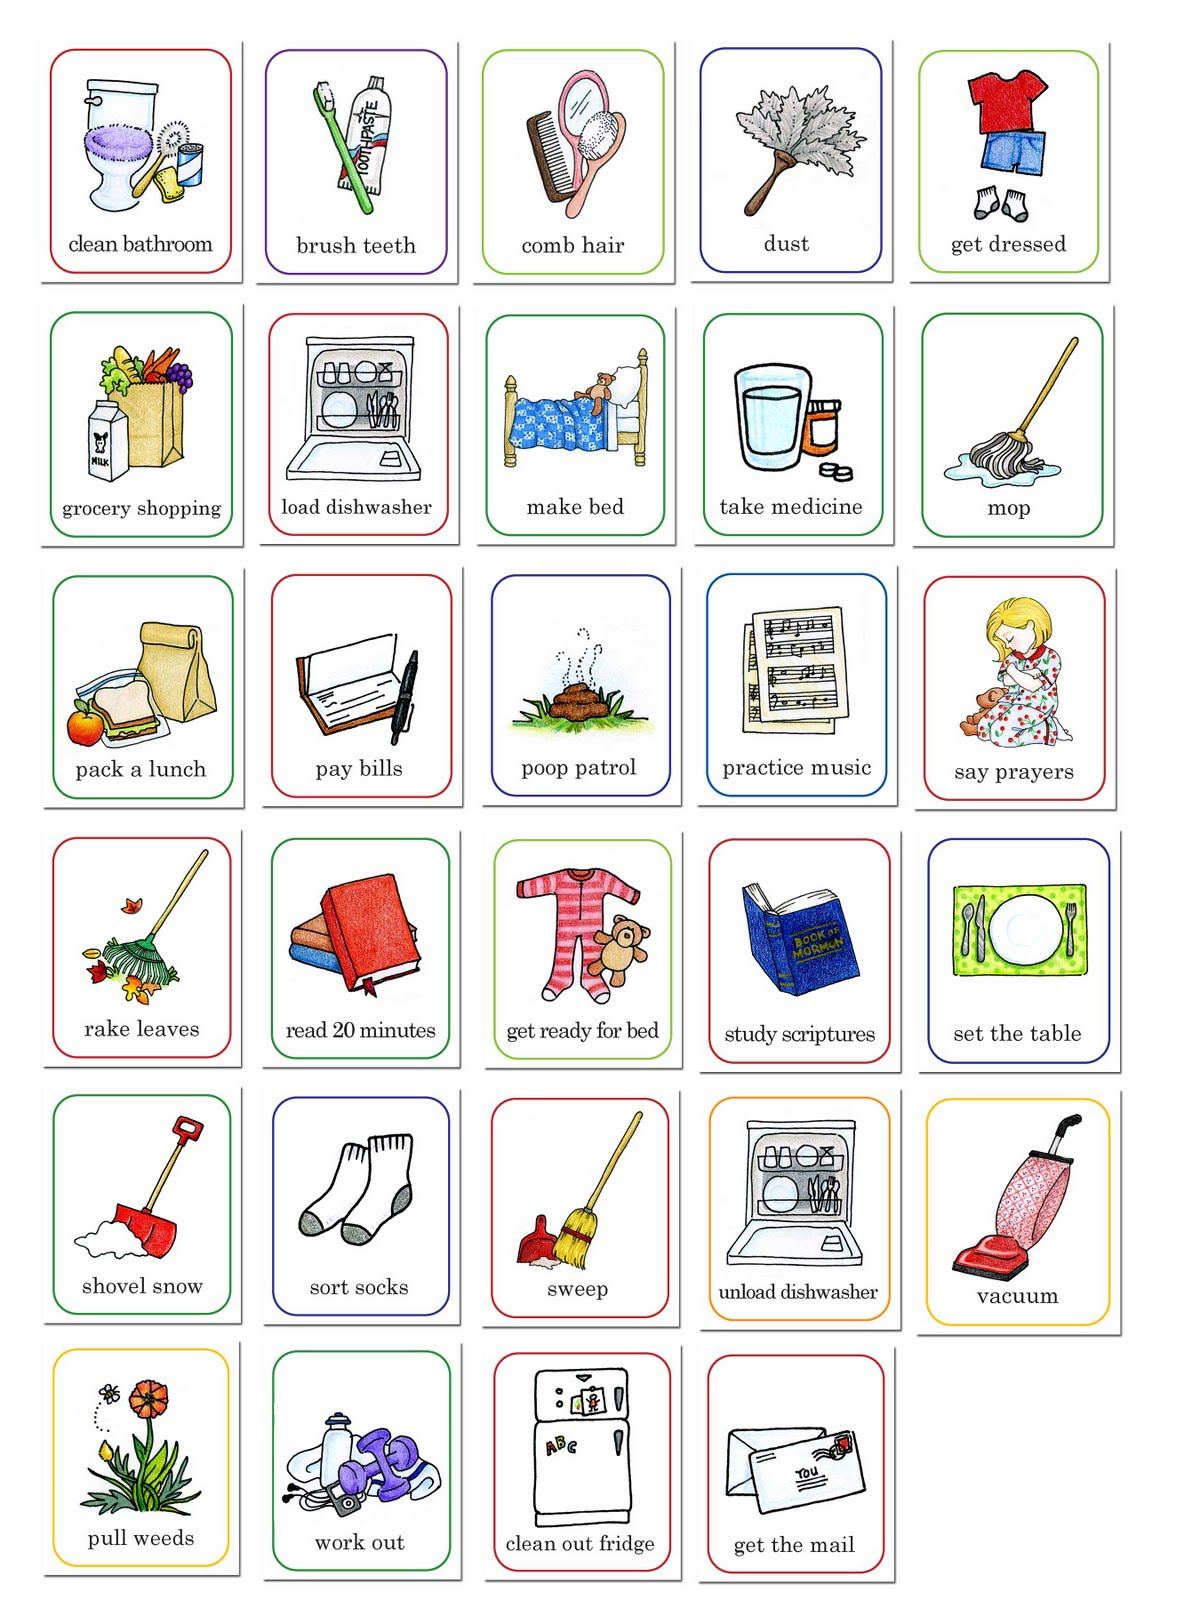 Free Chores Cliparts, Download Free Clip Art, Free Clip Art.